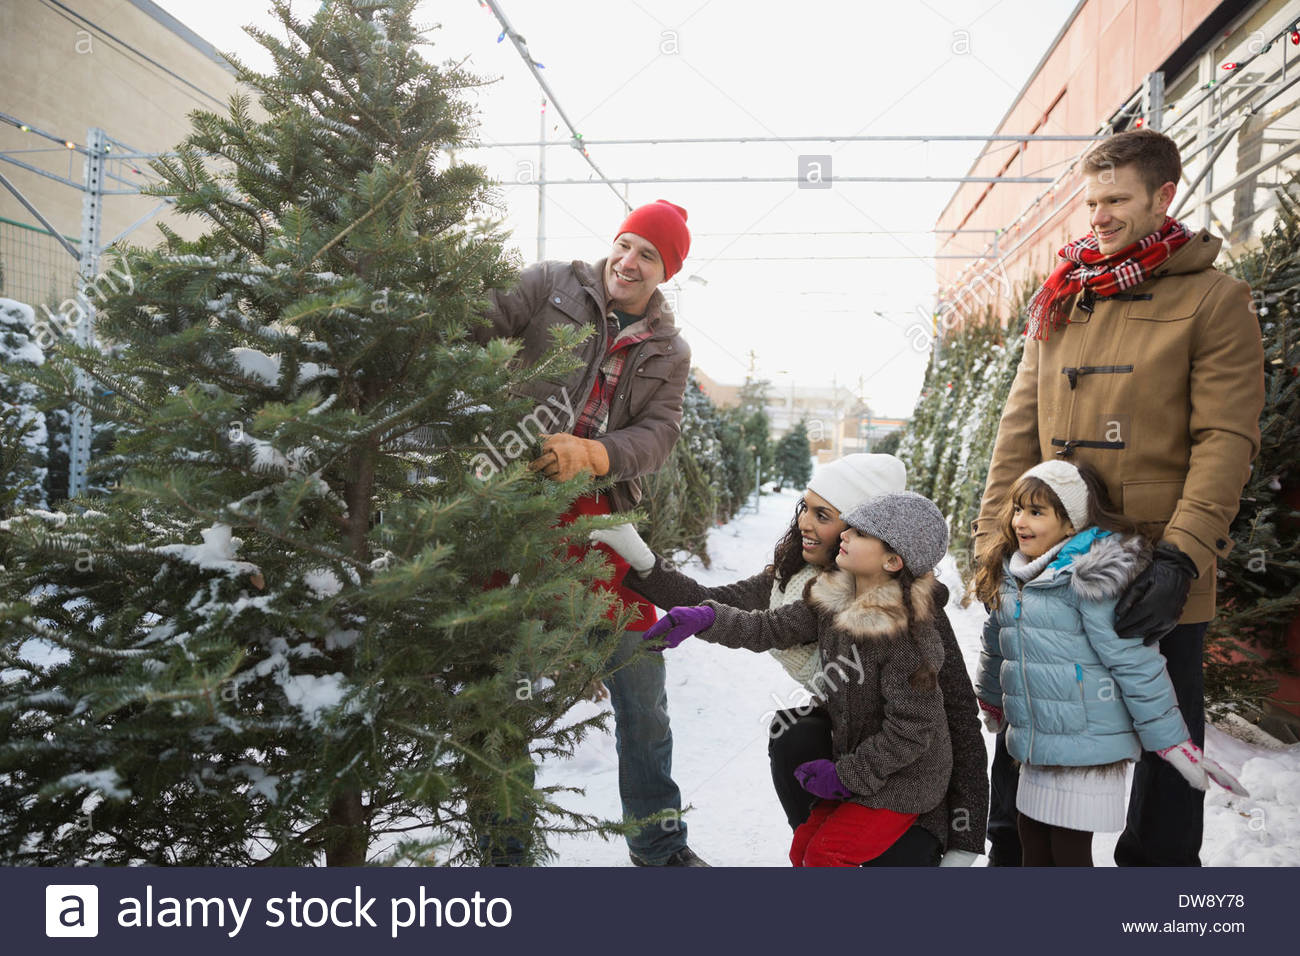 Family shopping for Christmas tree - Stock Image